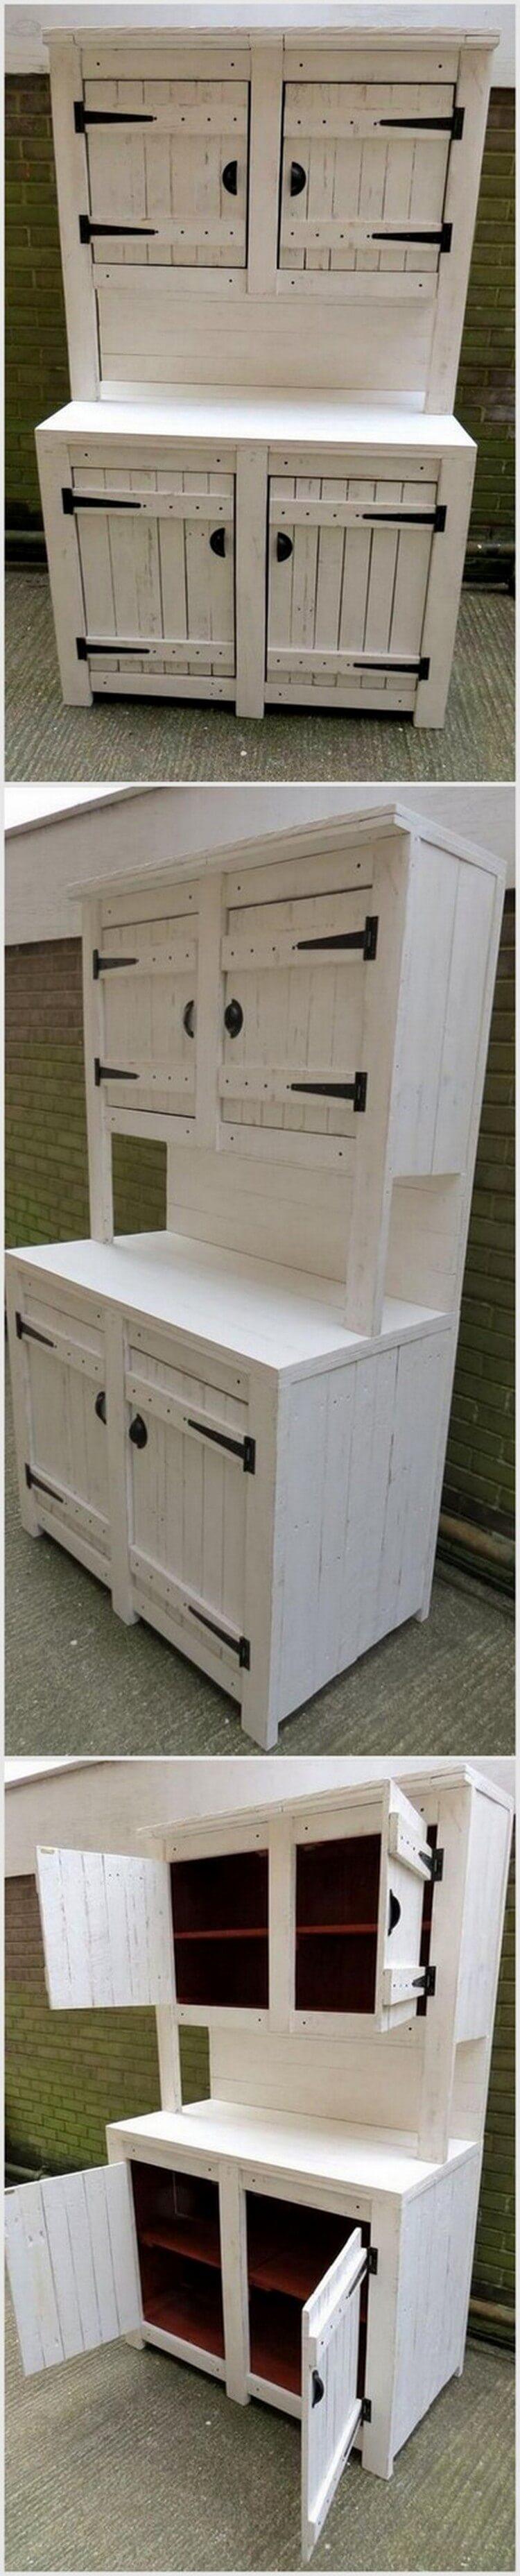 Wood Pallet Kitchen Cabinets - Hutch